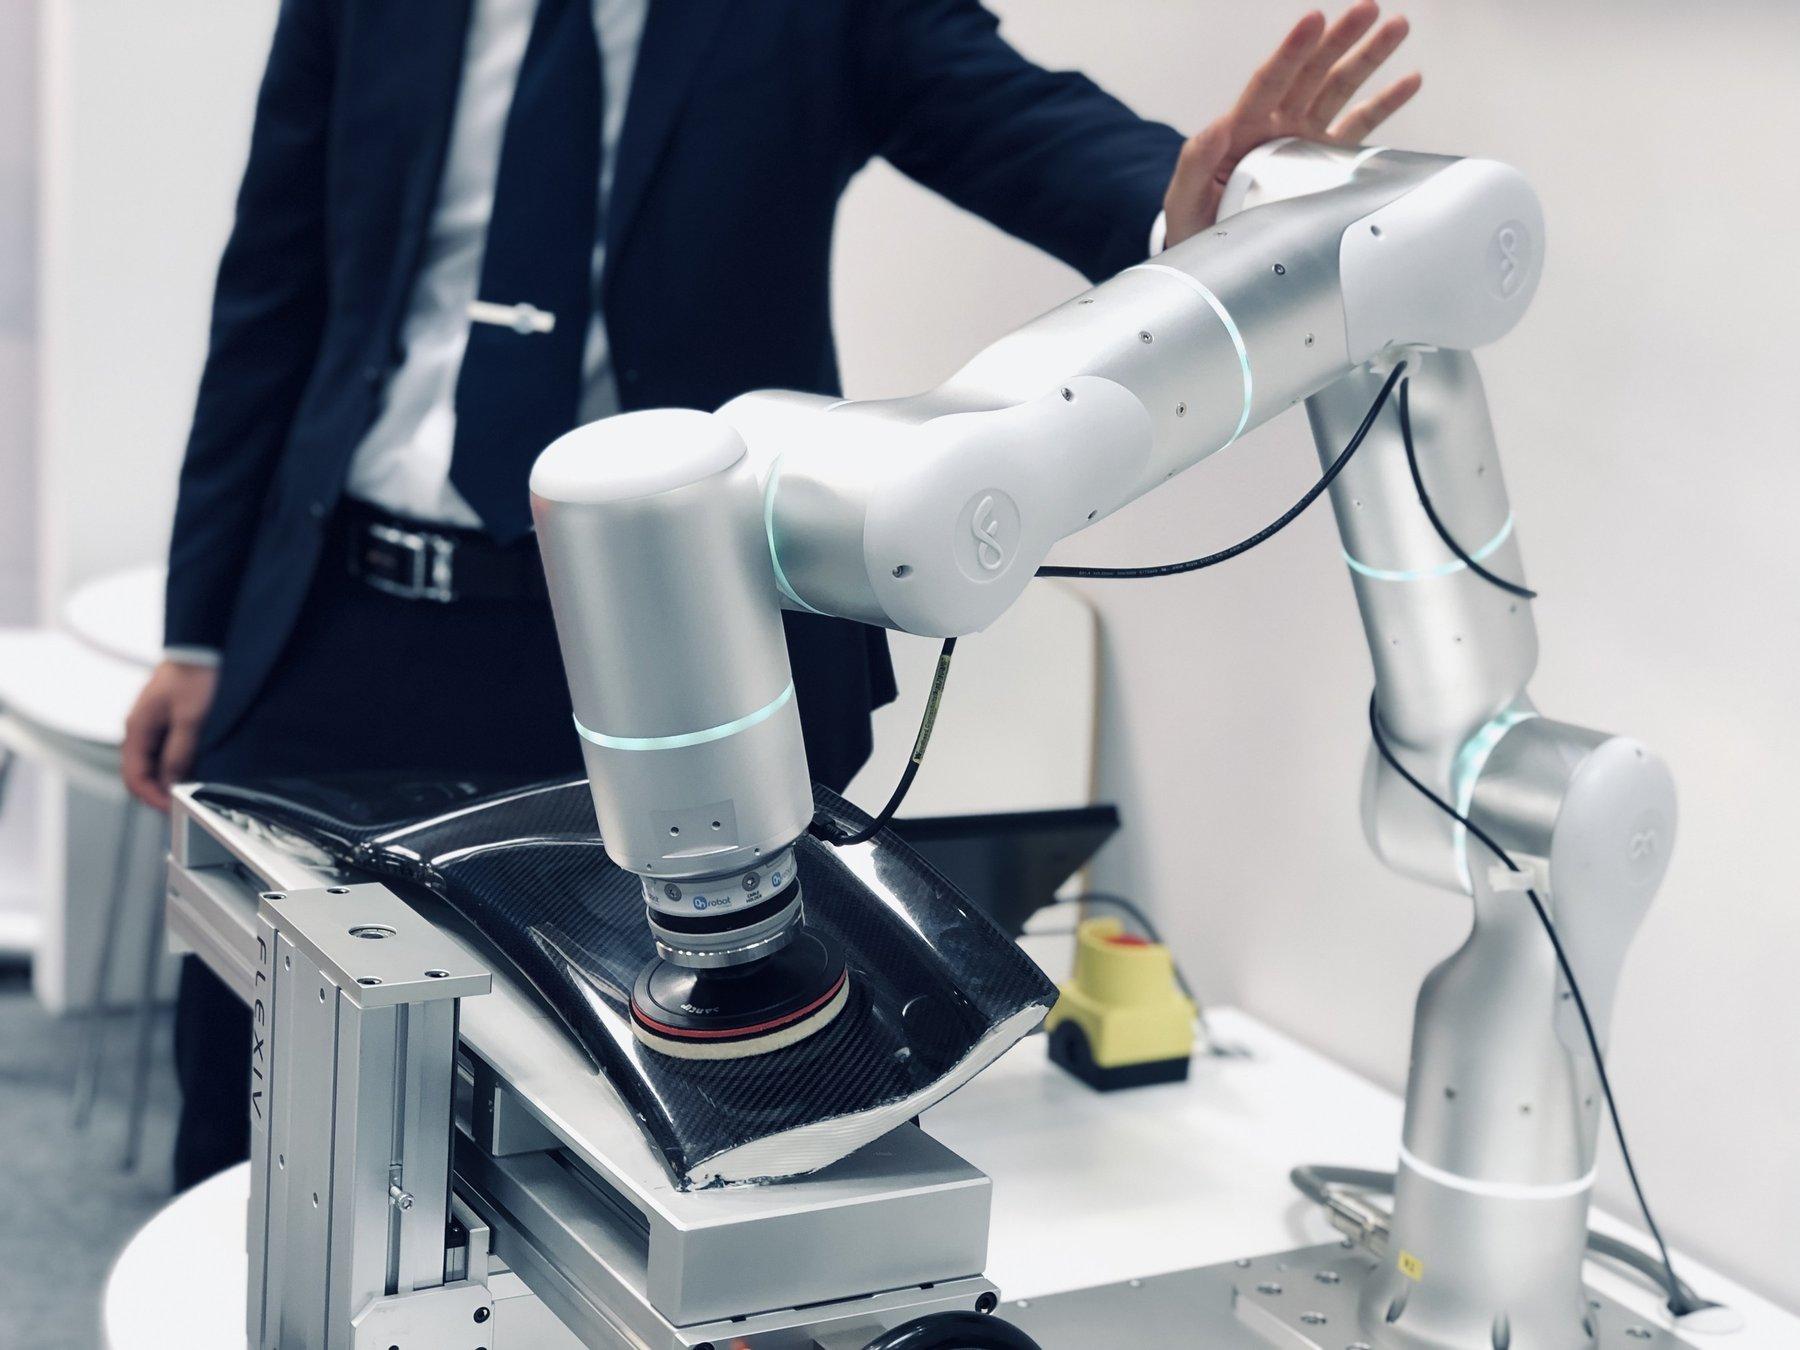 What's New In Robotics? 05.04.2019